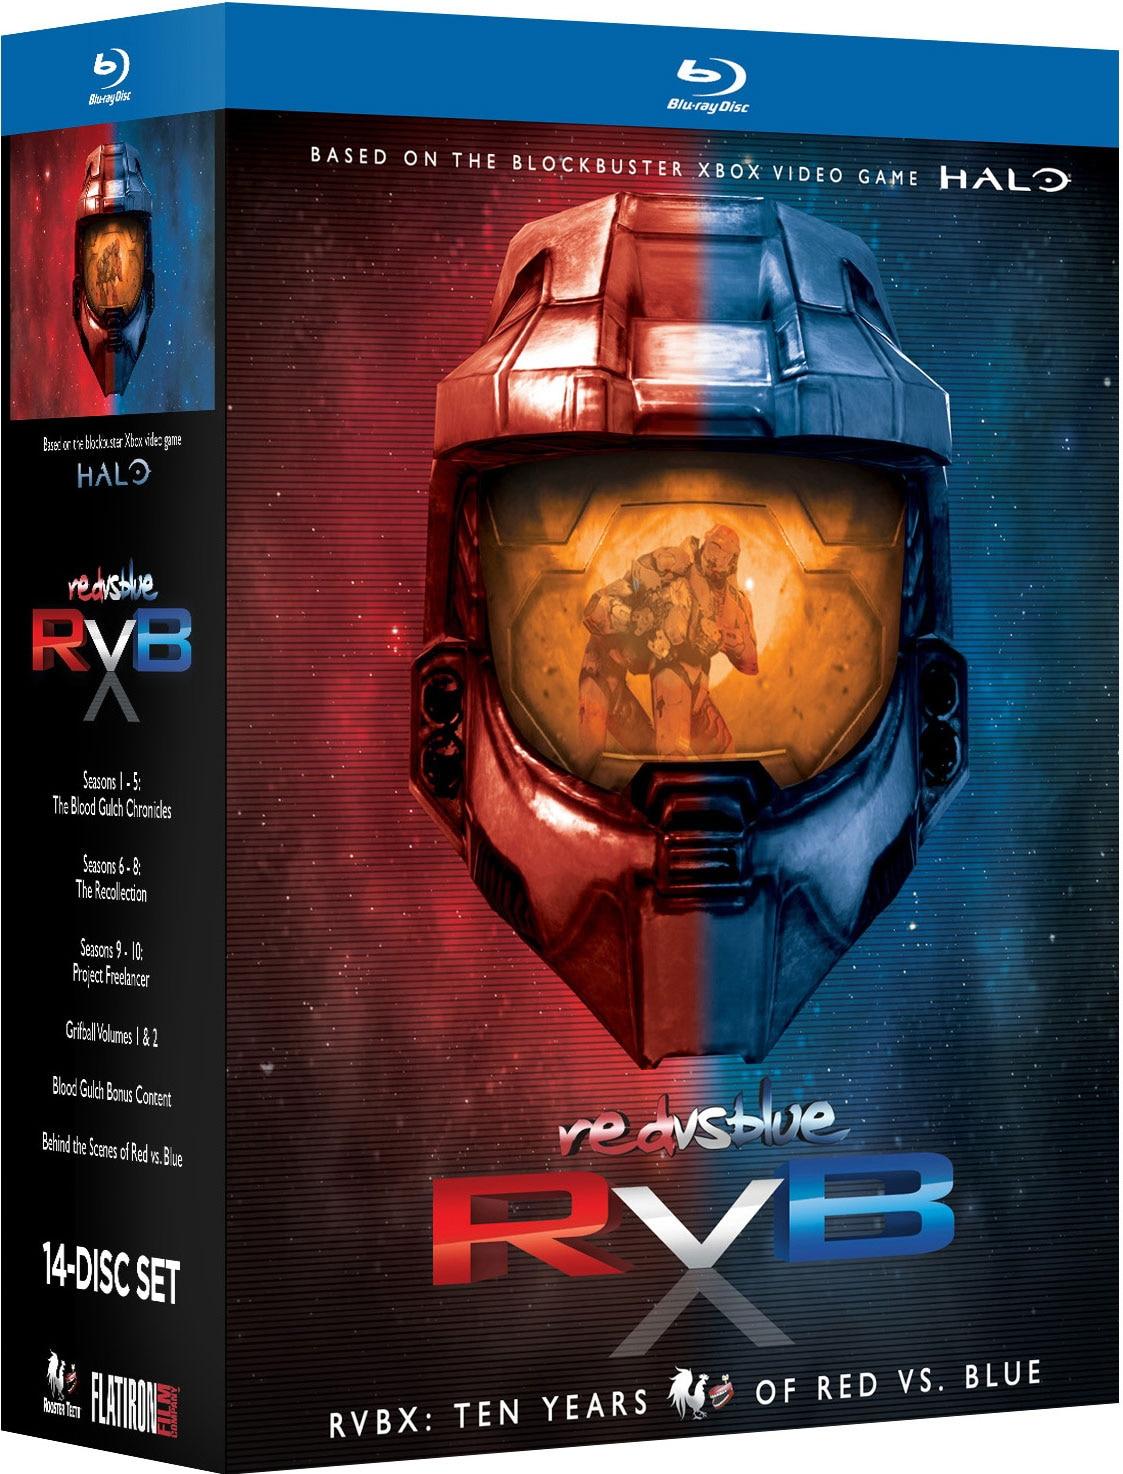 RVBX: Ten Years of Red Vs. Blue (Blu-ray Disc)